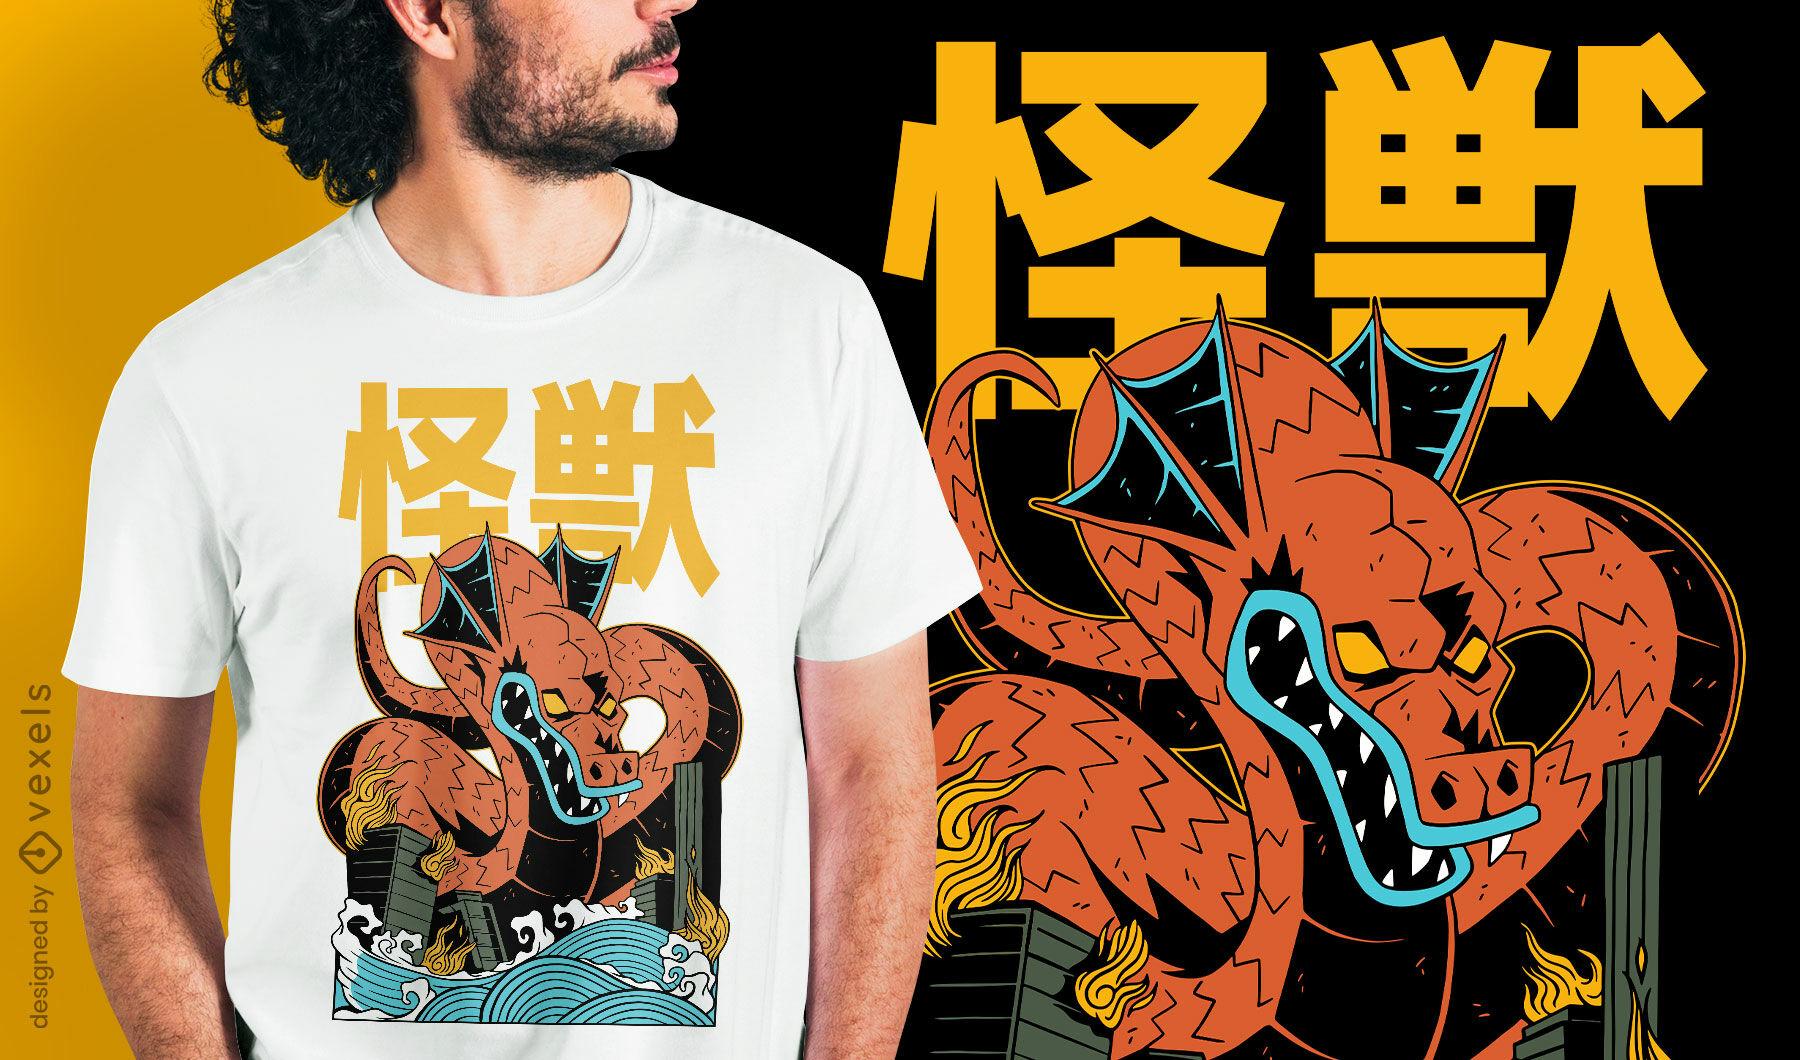 Manda japanese creature t-shirt design